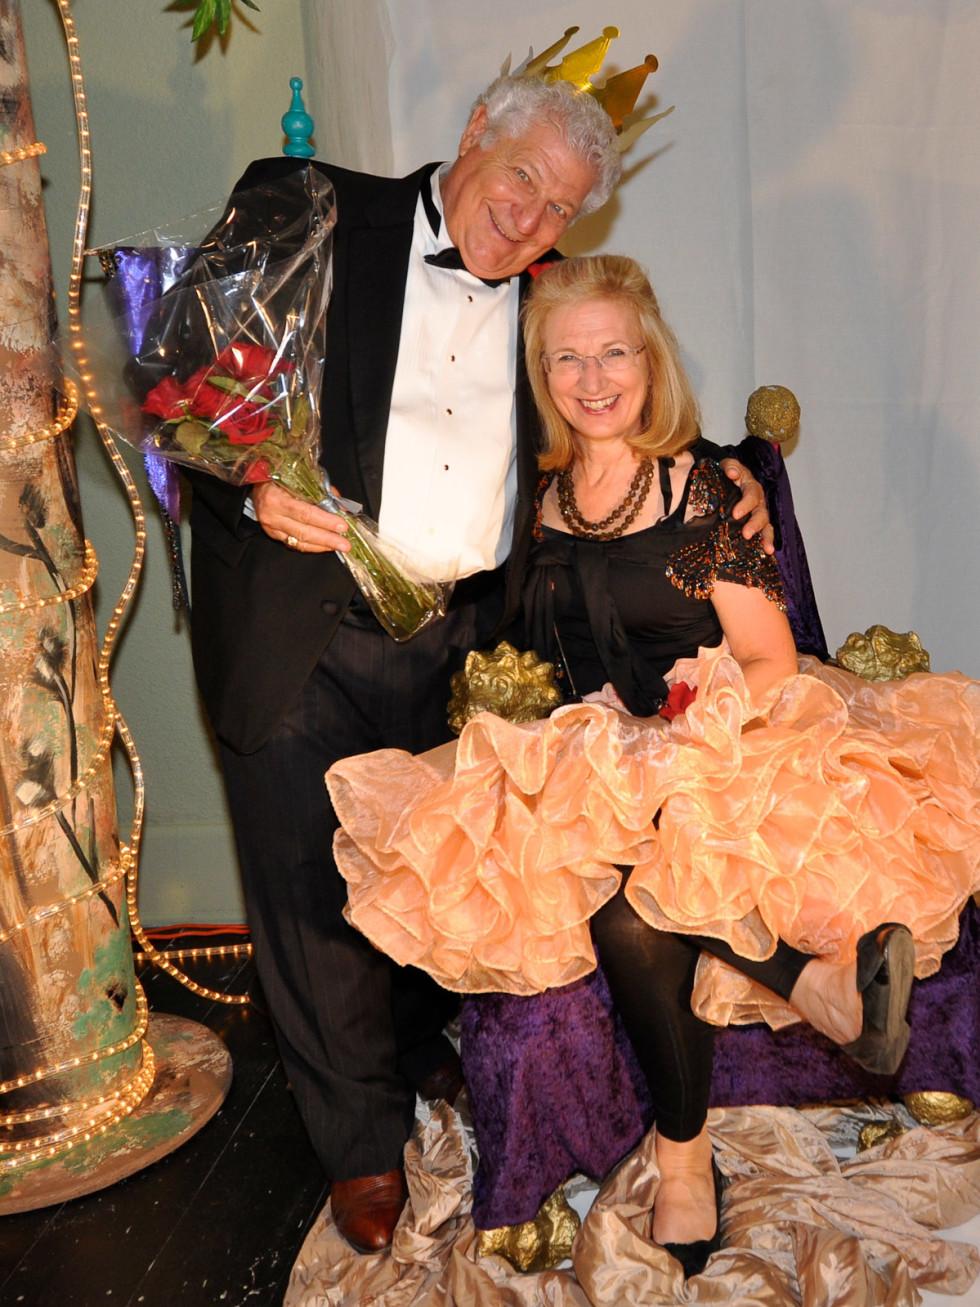 News_Aurora_prom_Ronald Stein and Kat Blakeslee